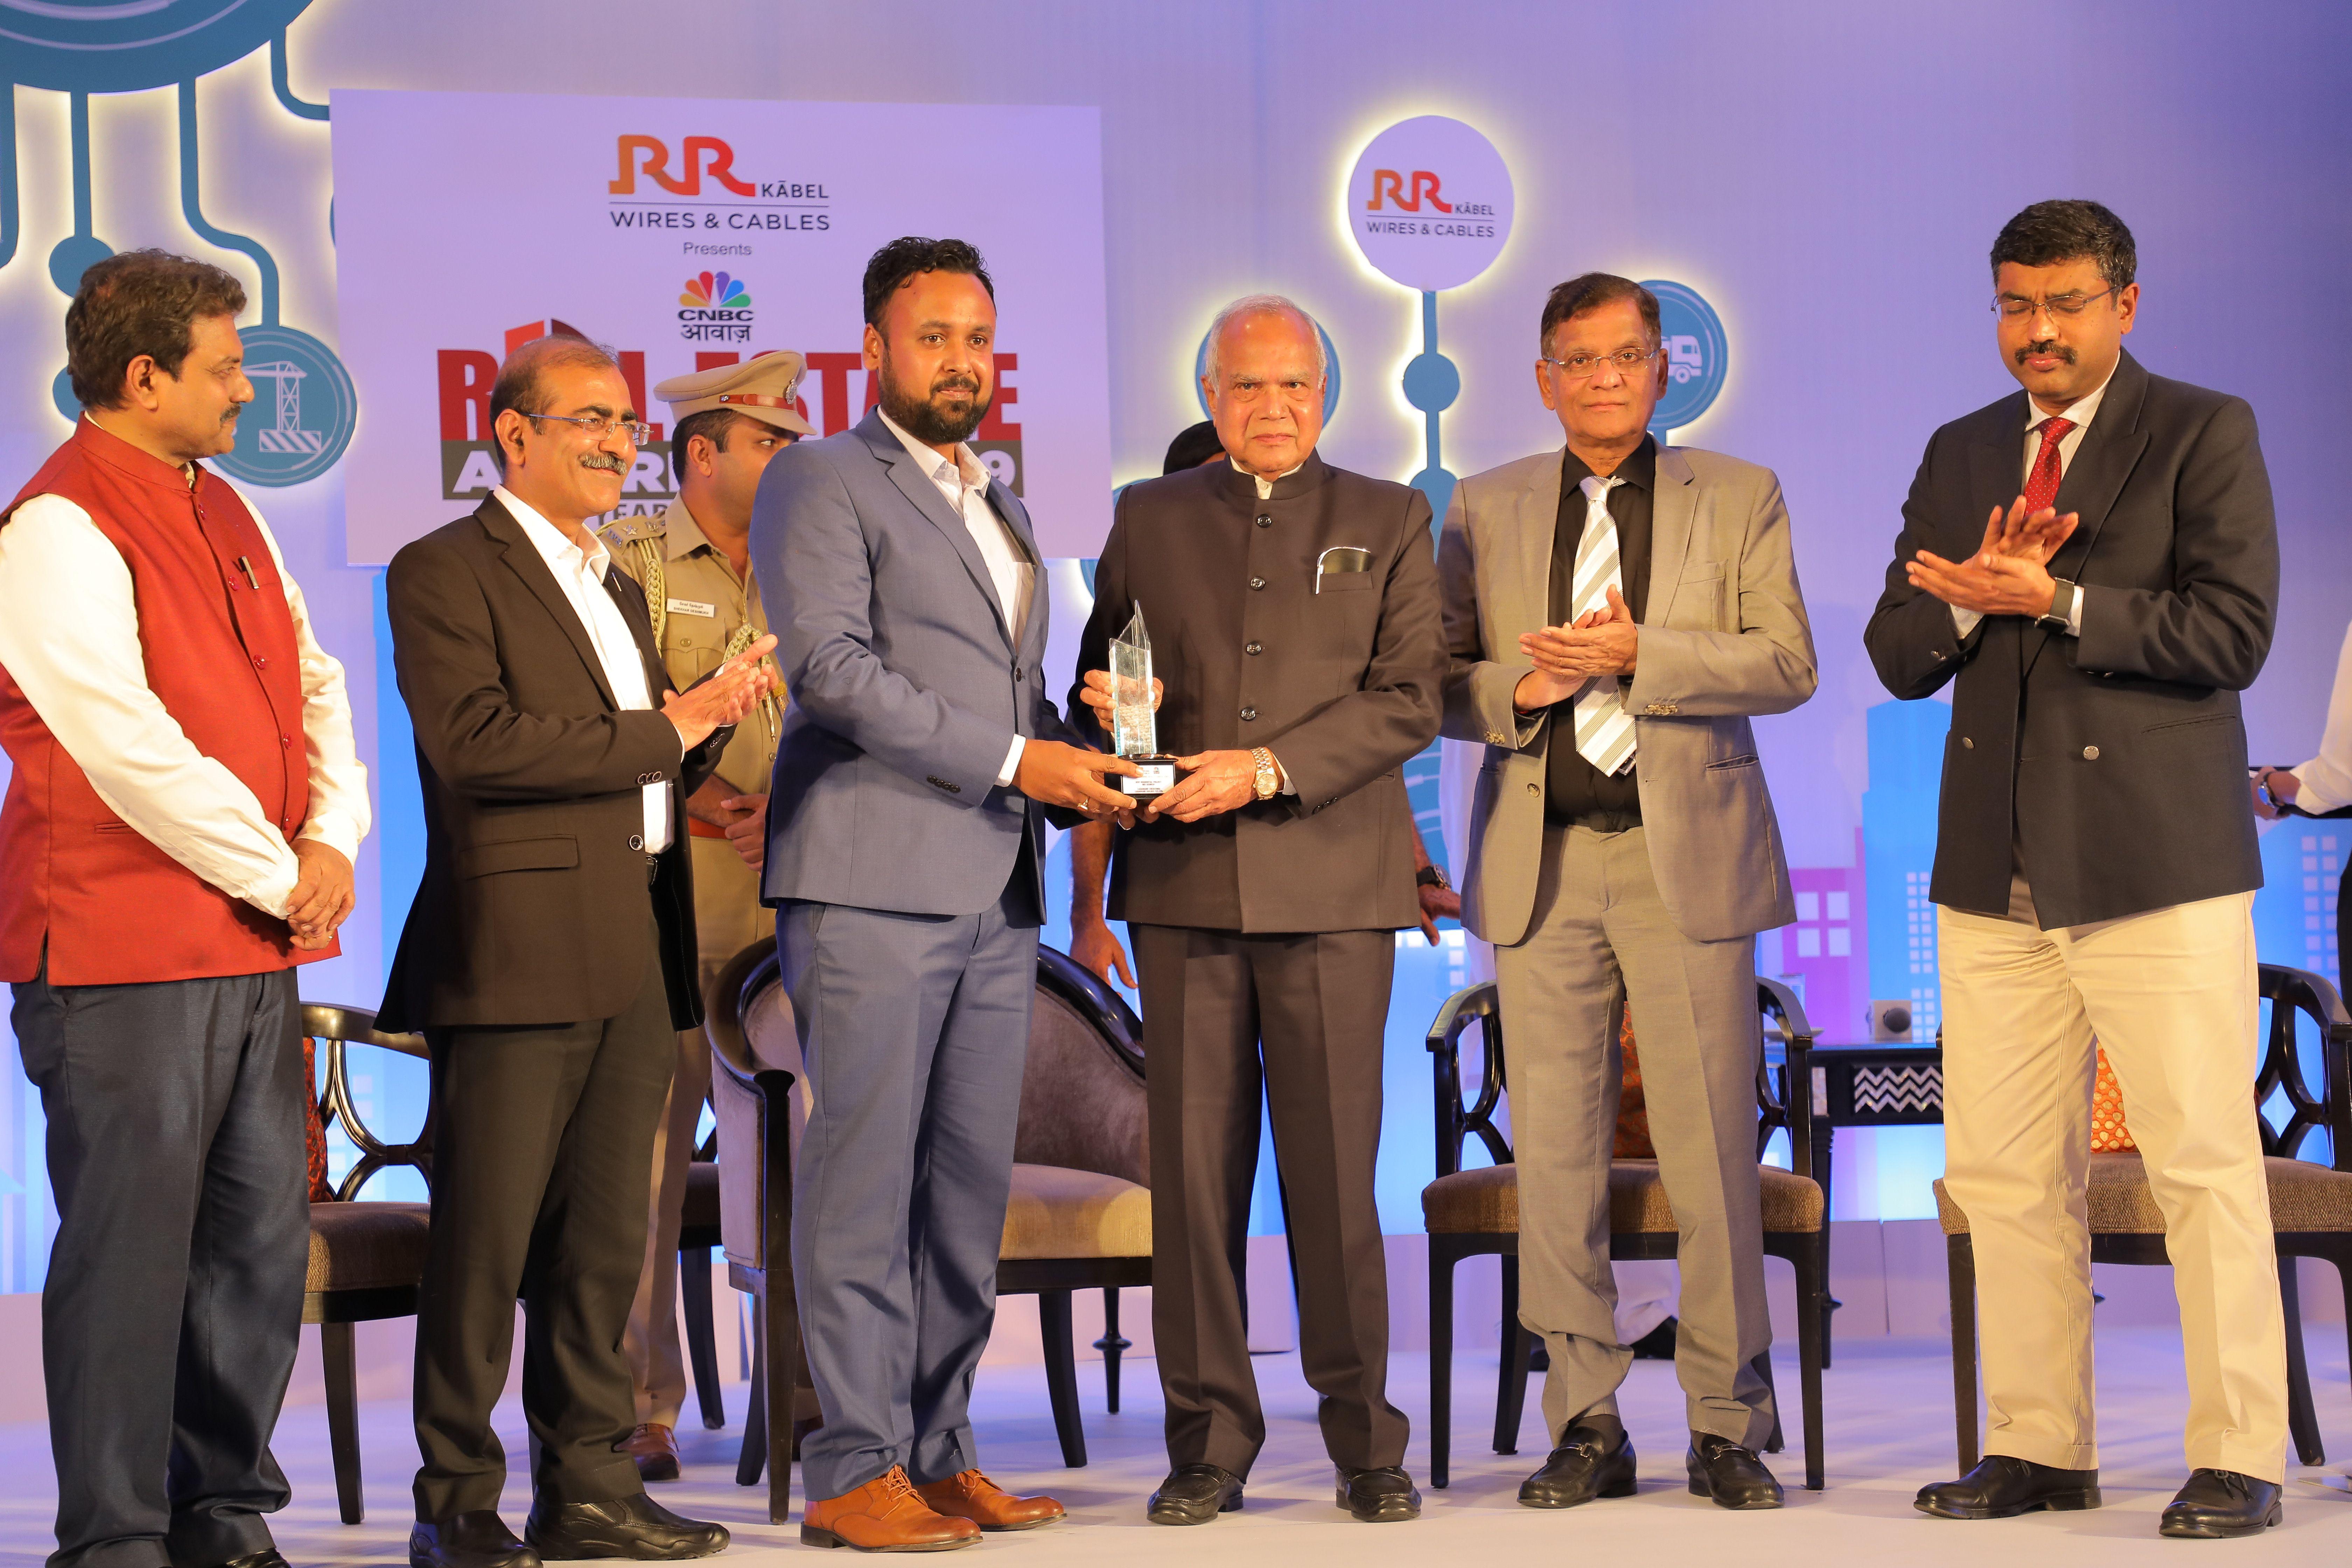 Mr.Gautam Aggarwal -VP, Product Development of Casagrand Builder Pvt.Ltd. receiving the award from Tamil Nadu governor Mr. Banwarilal Purohit